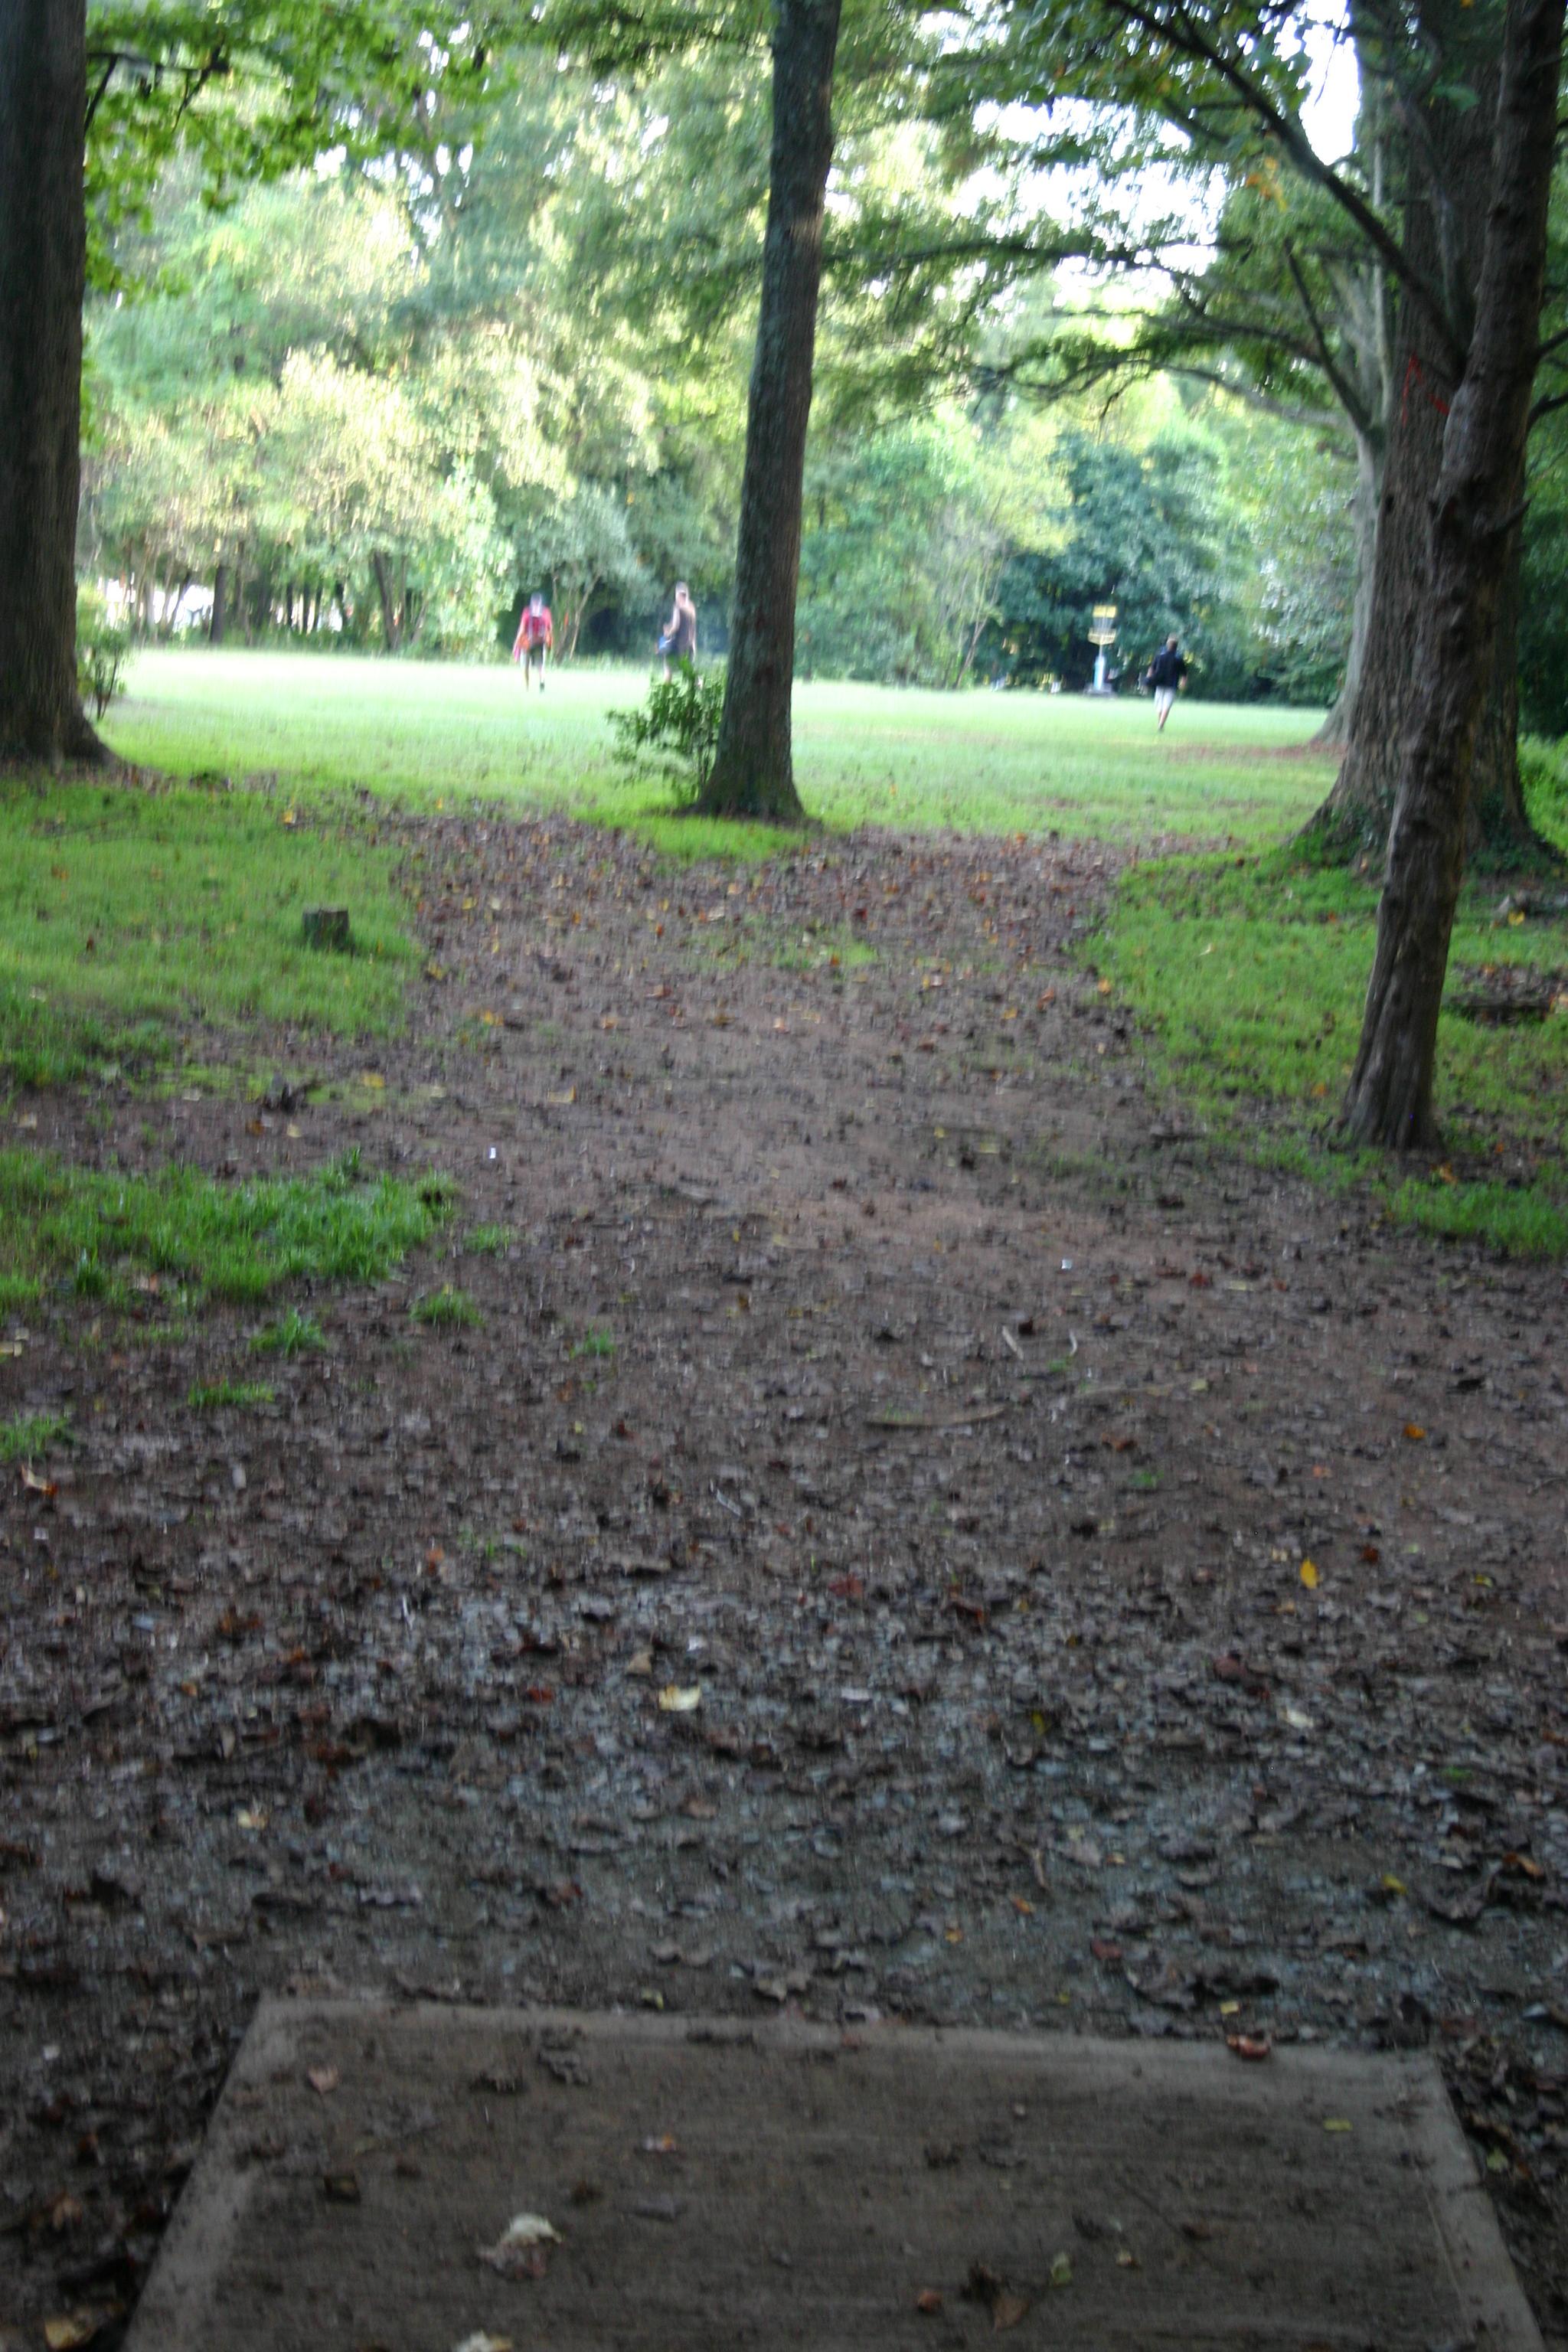 Sugaw Creek Park